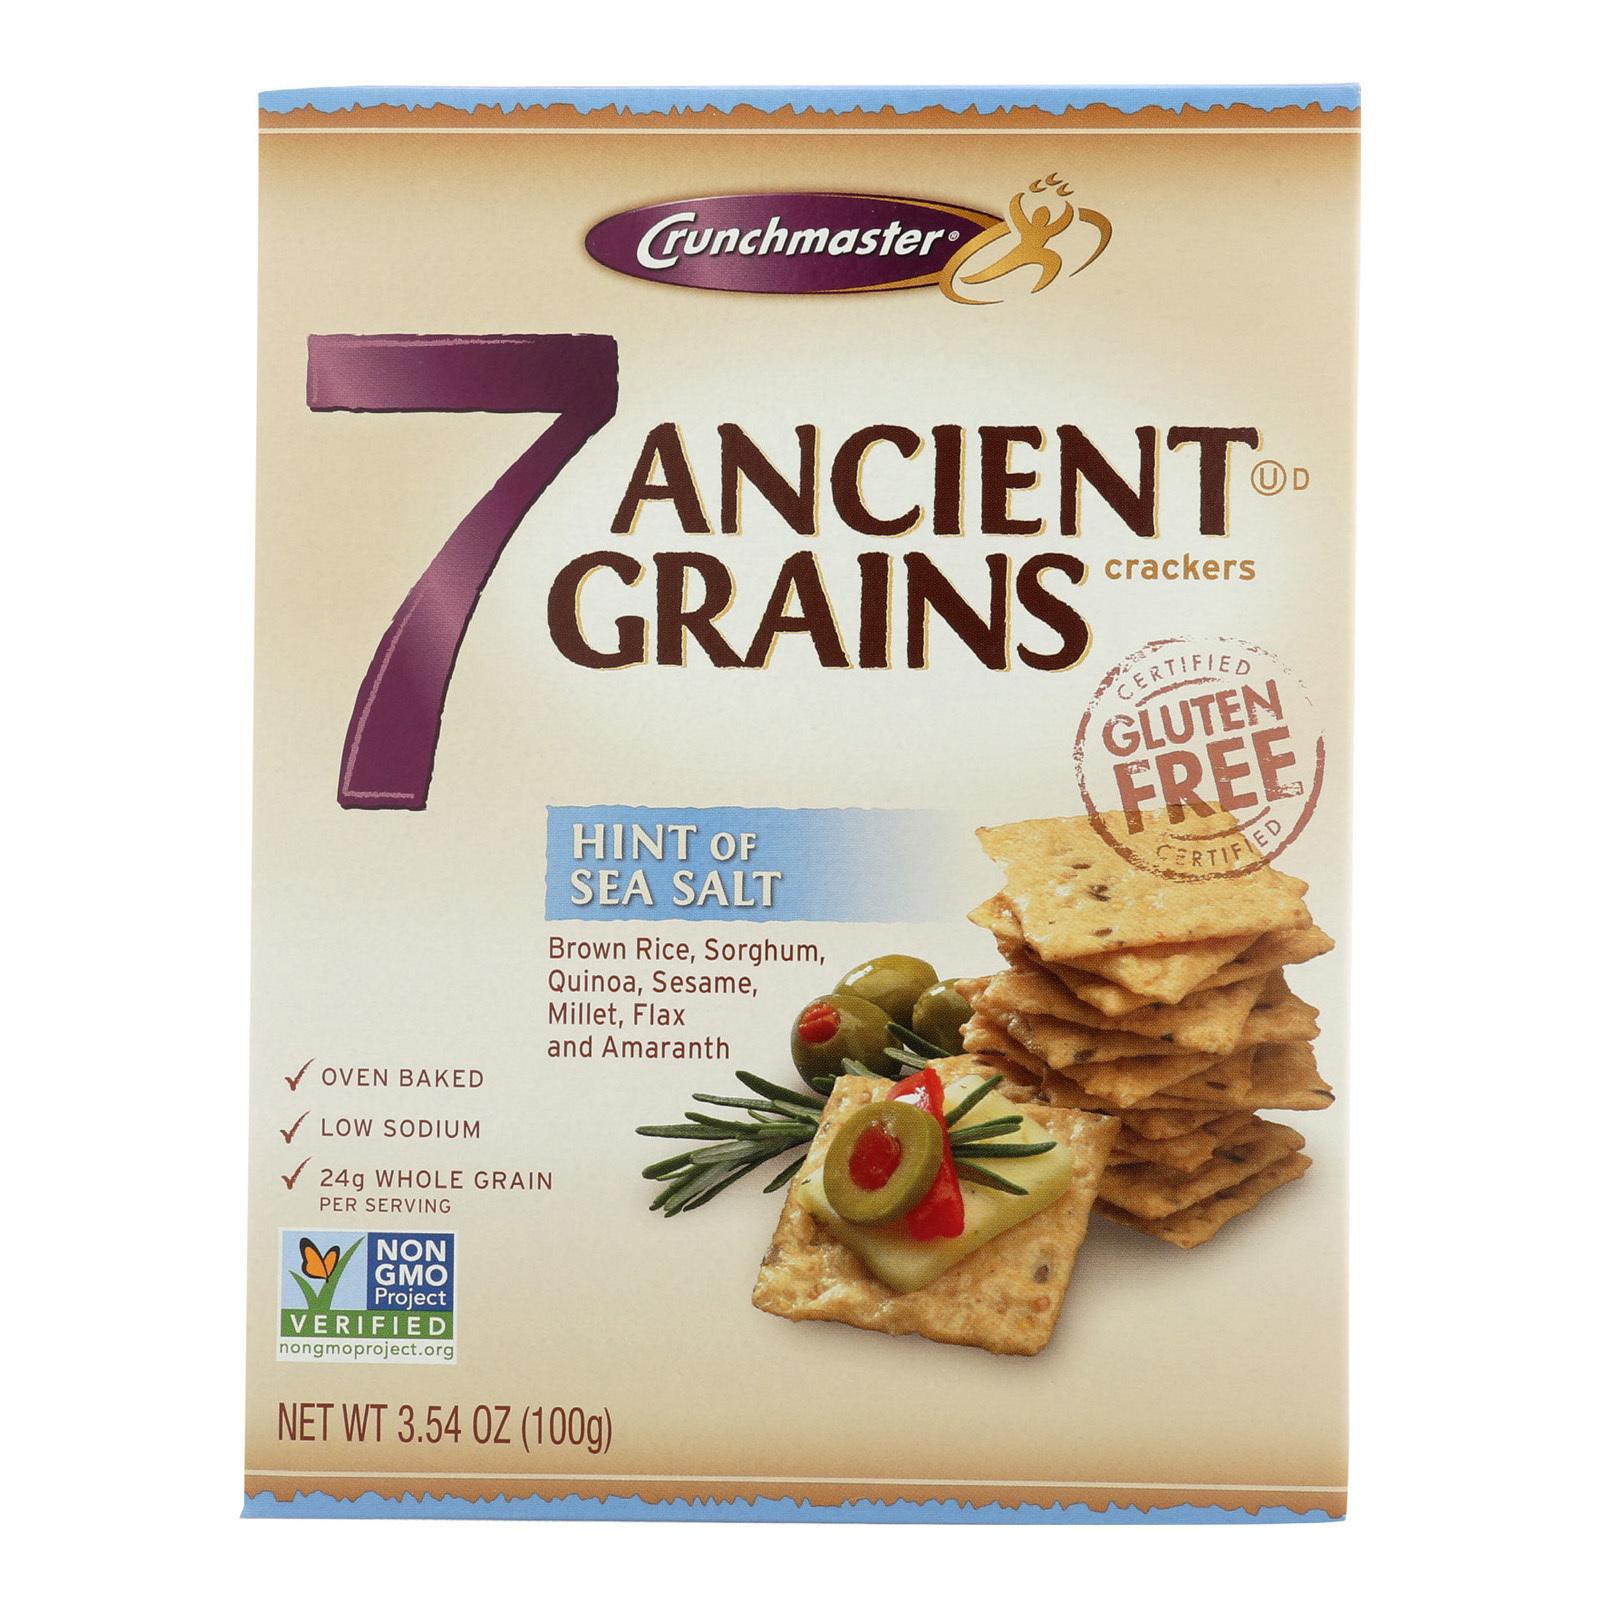 Crunchmaster 7 Ancient Grains Crackers - Sea Salt - Case of 12 - 3.5 oz.